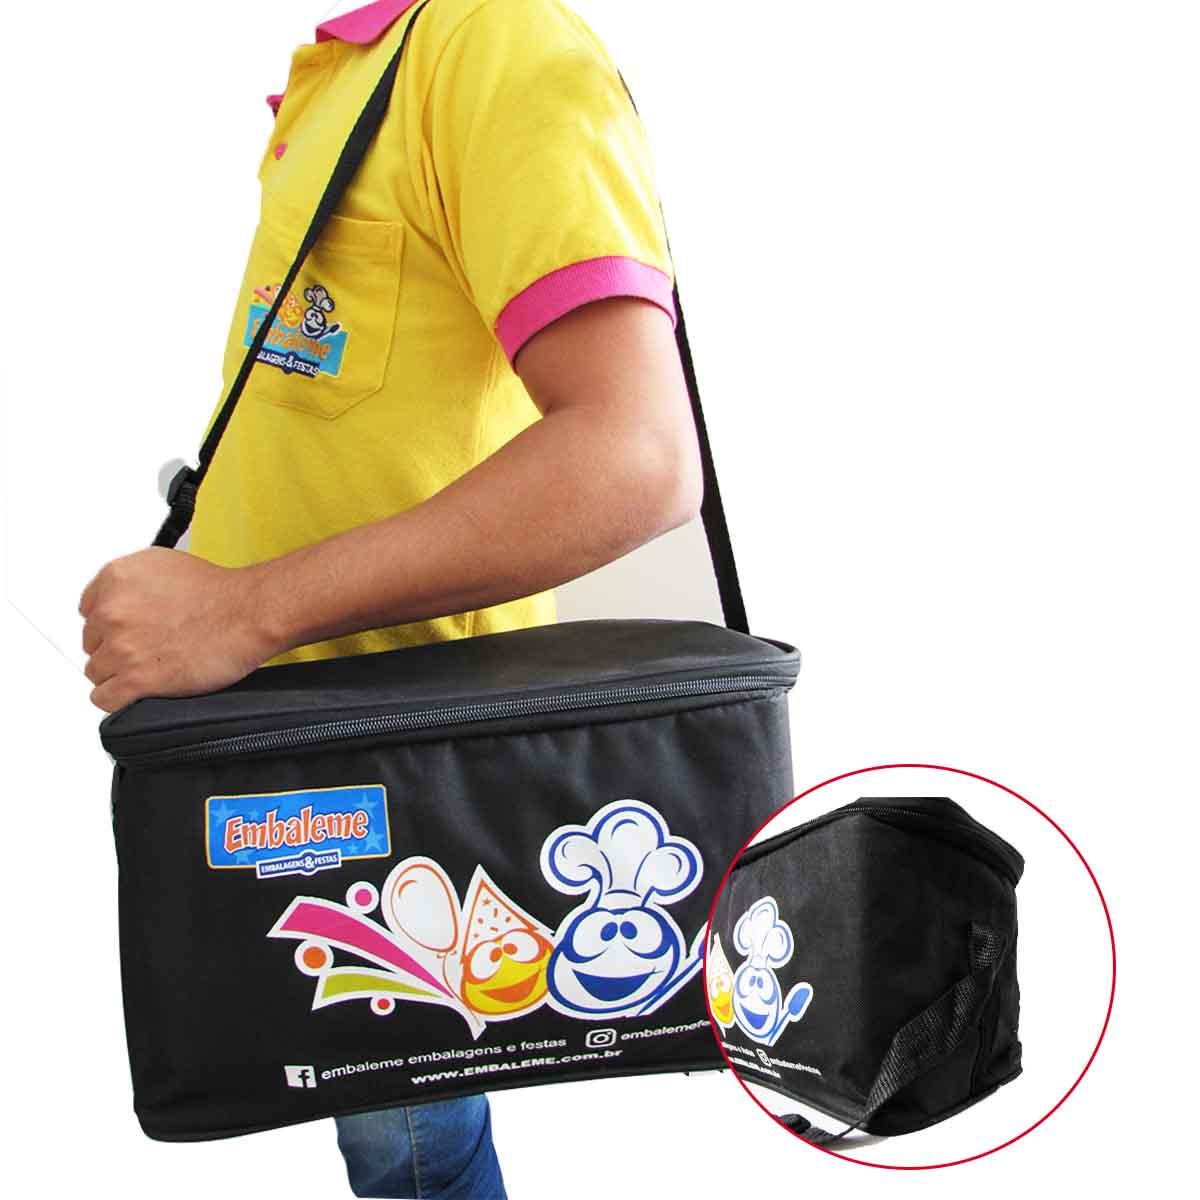 Bolsa Térmica Embaleme (cores variadas) 1 unidade